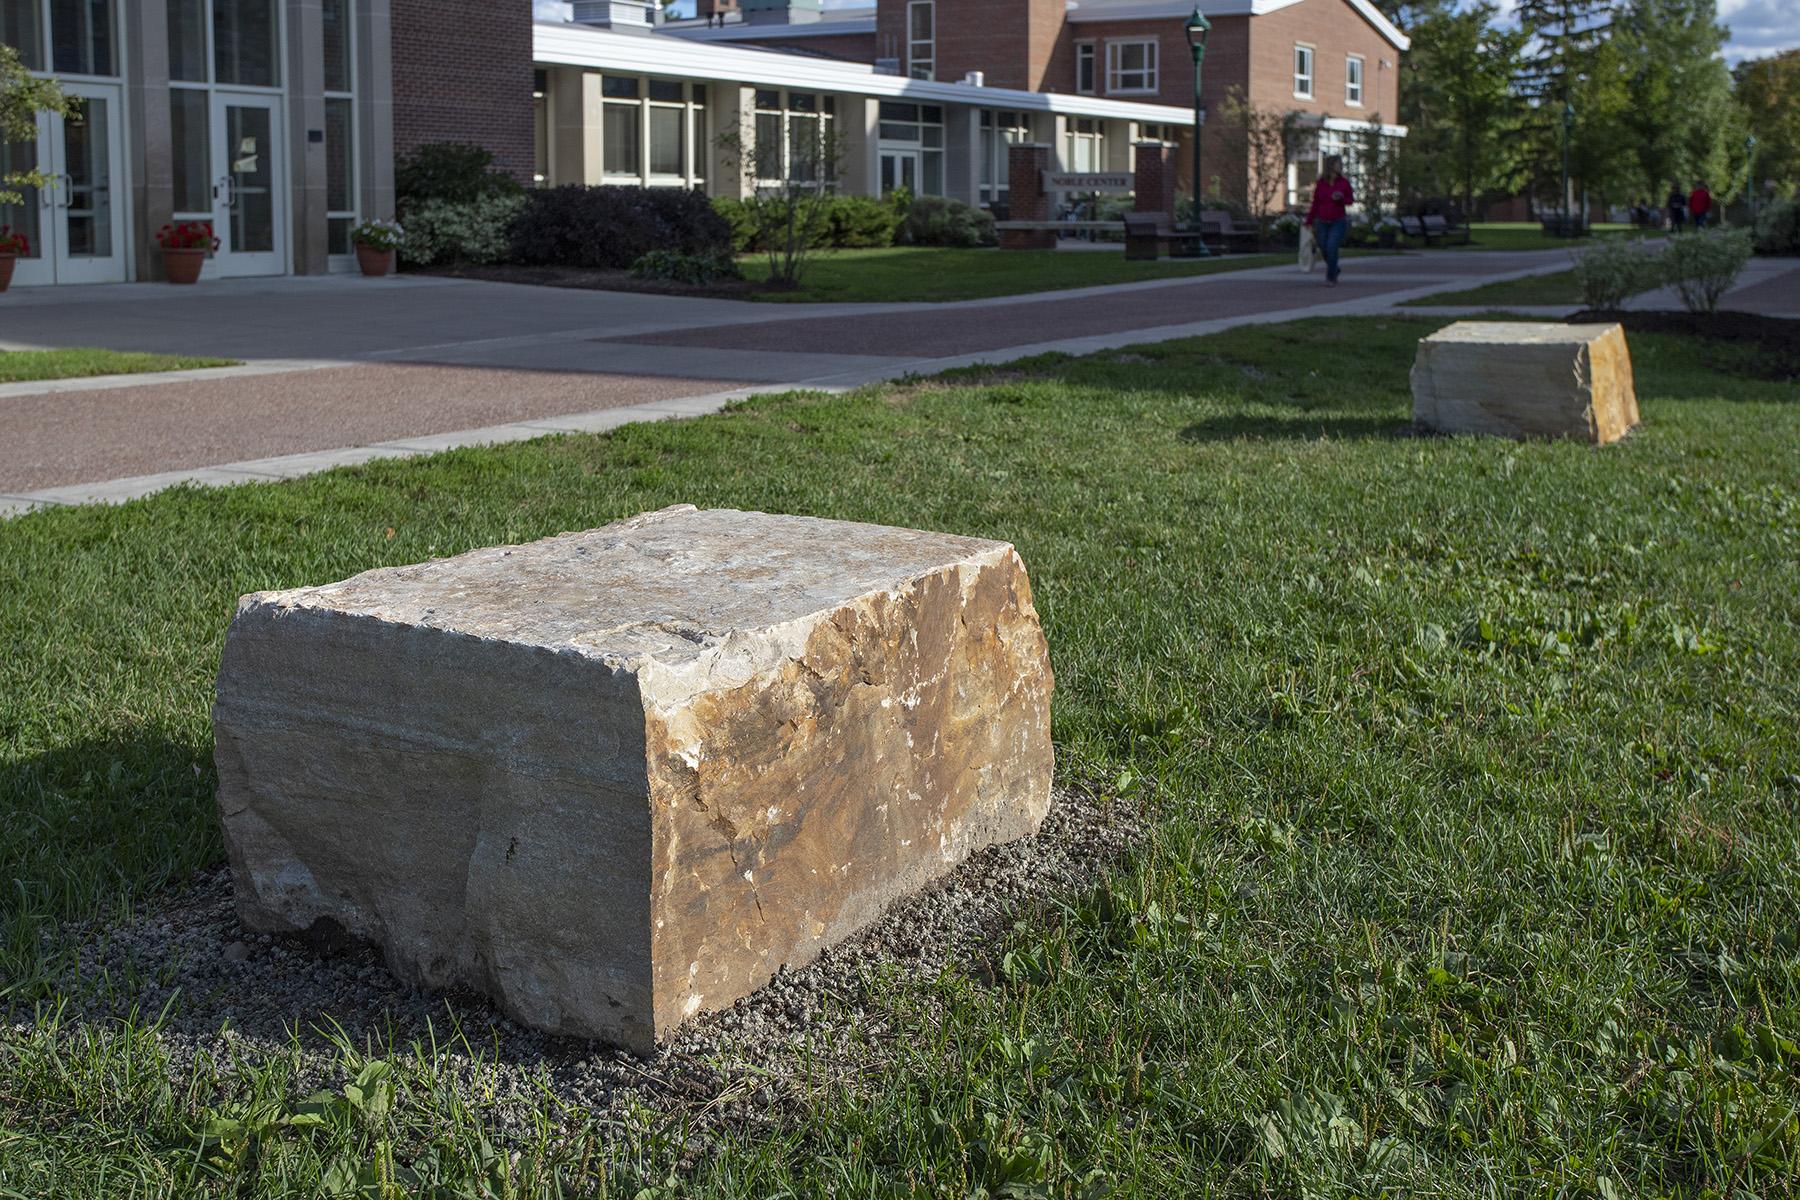 big stone in grass